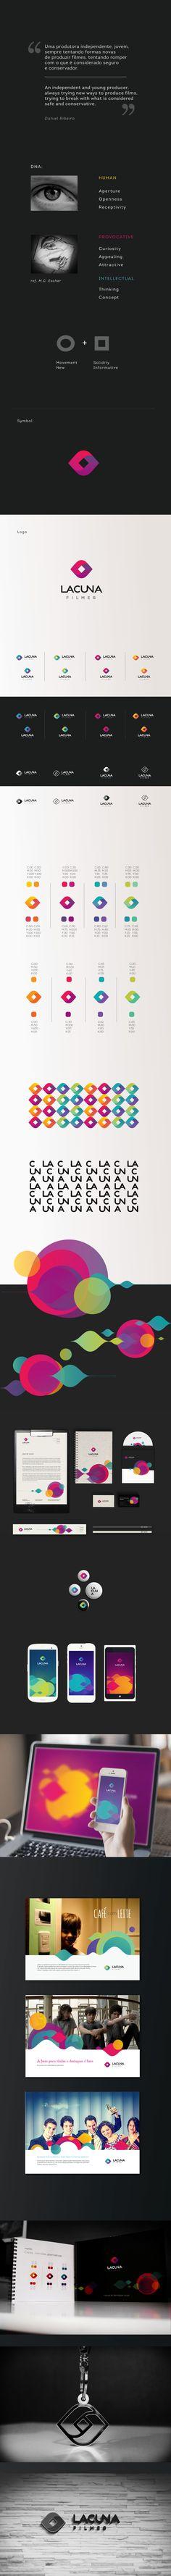 Lacuna Filmes by Amanda Louisi, via Behance